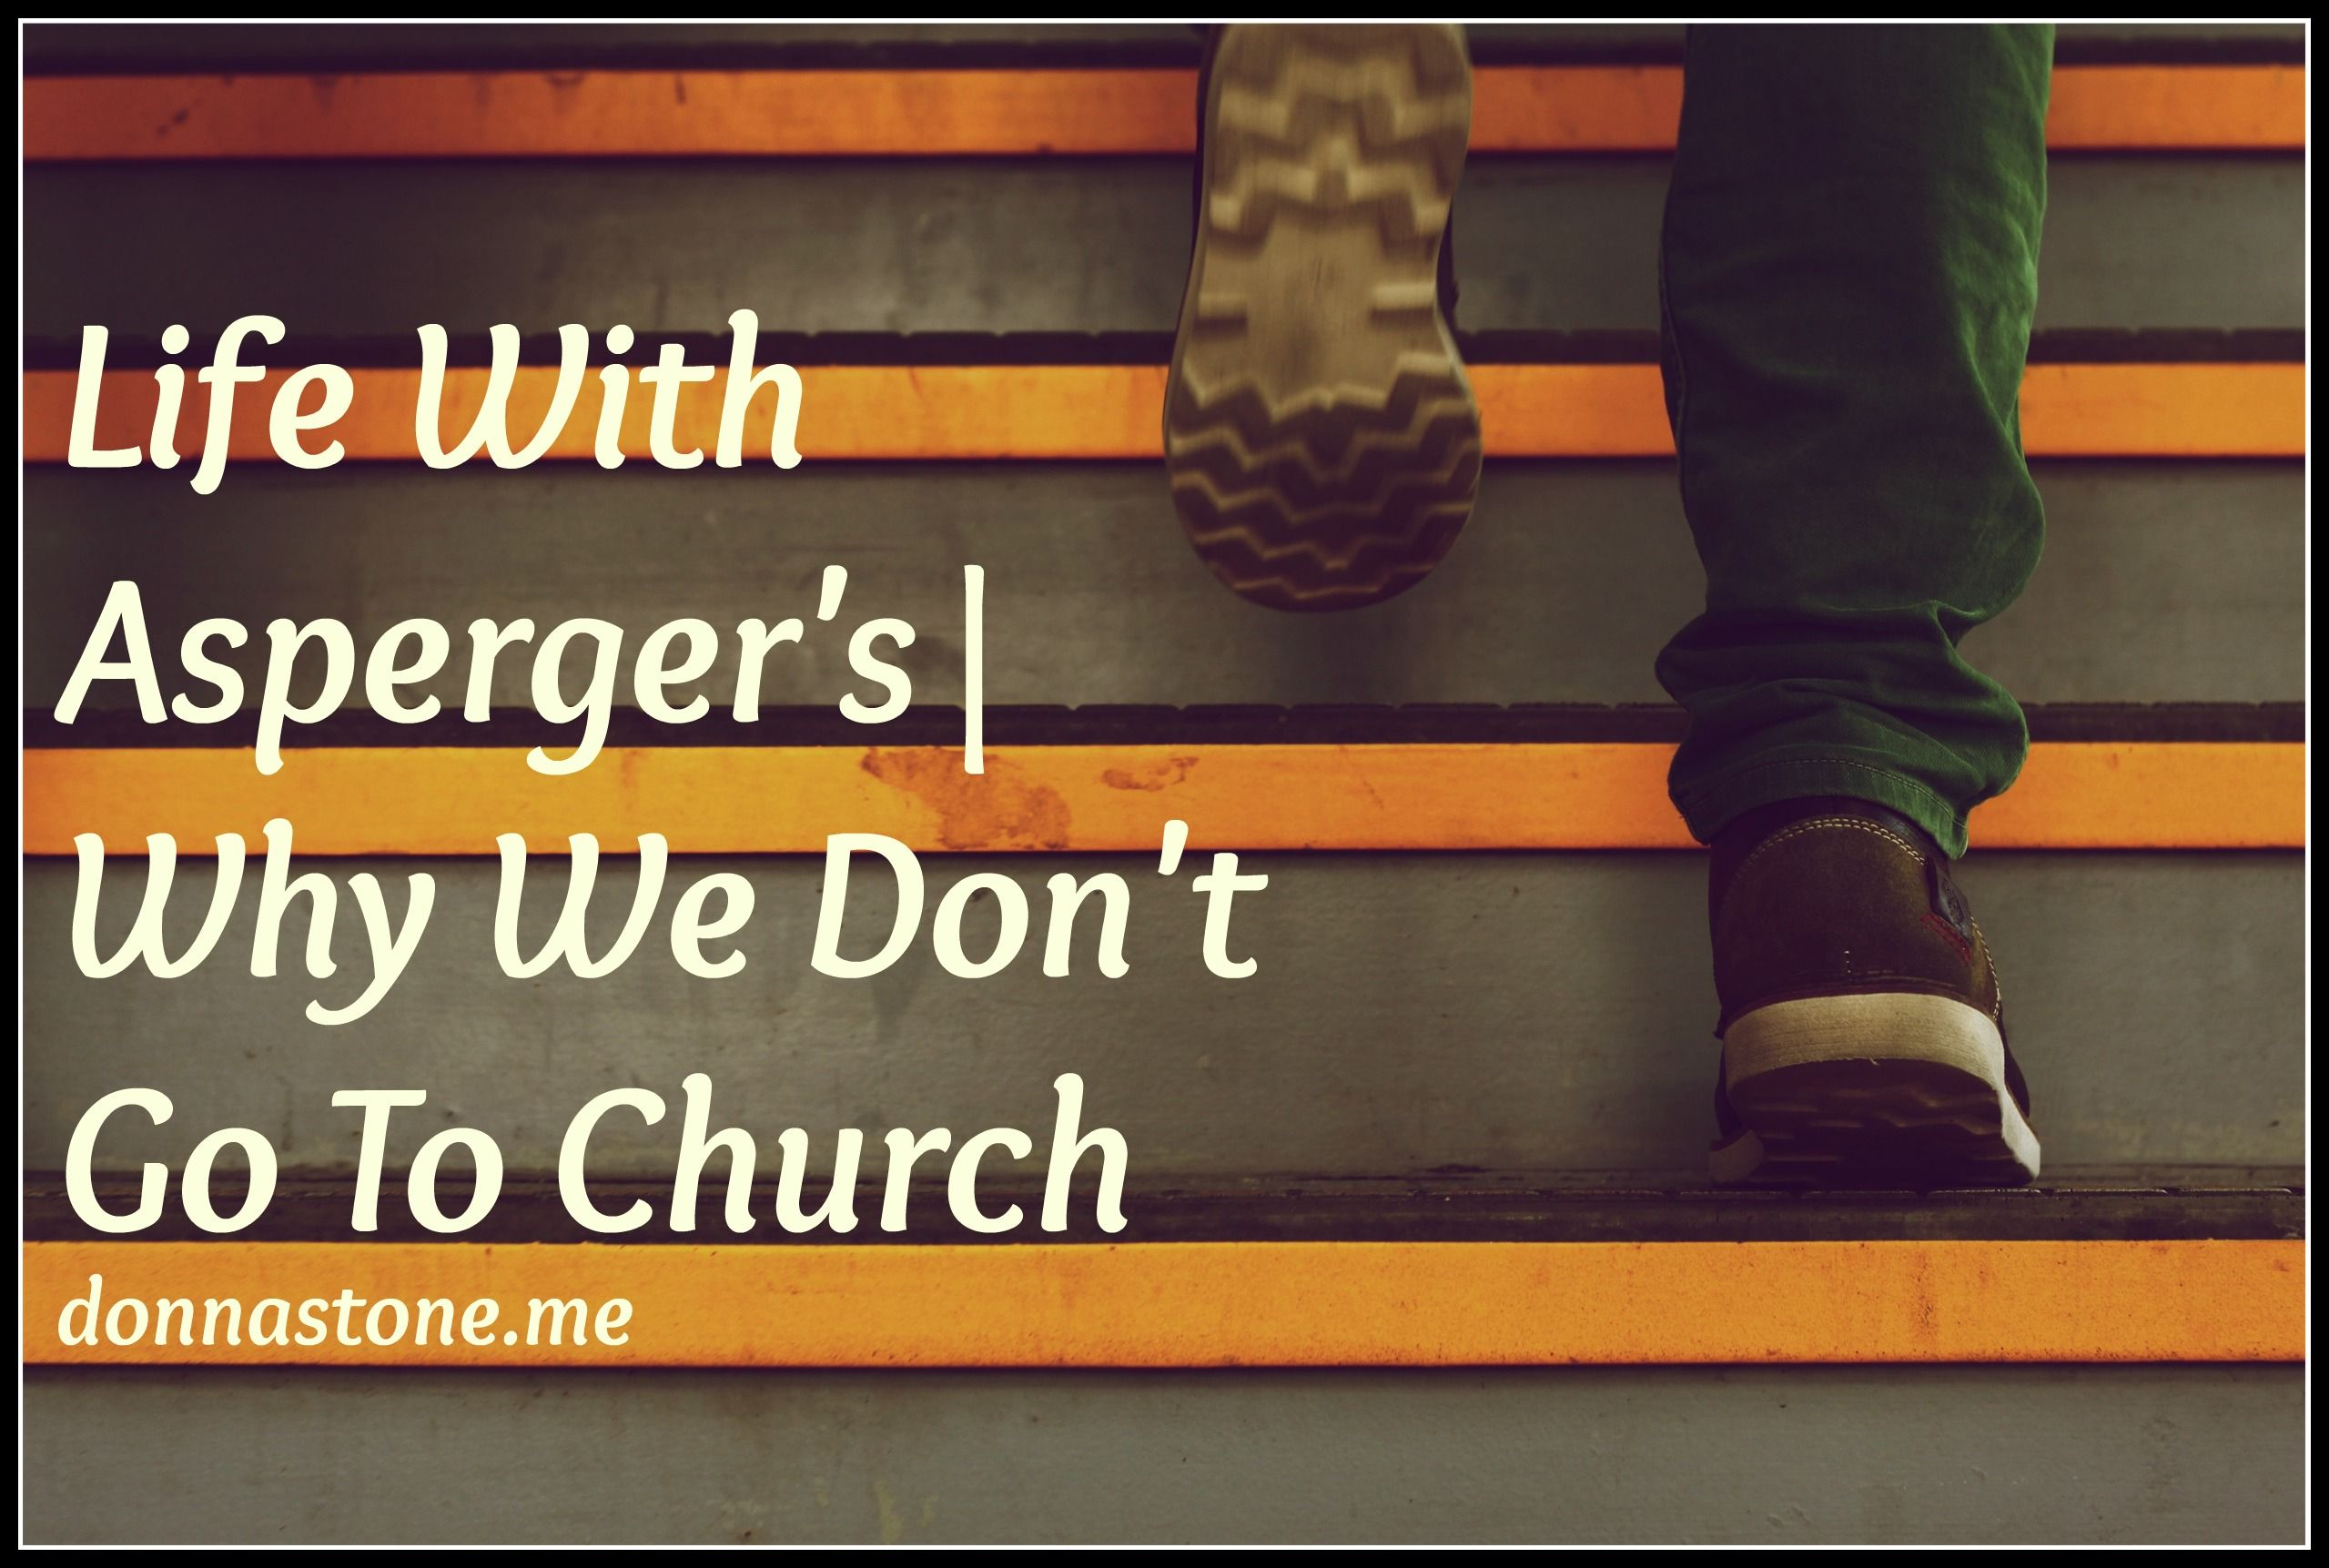 Aspergers and church